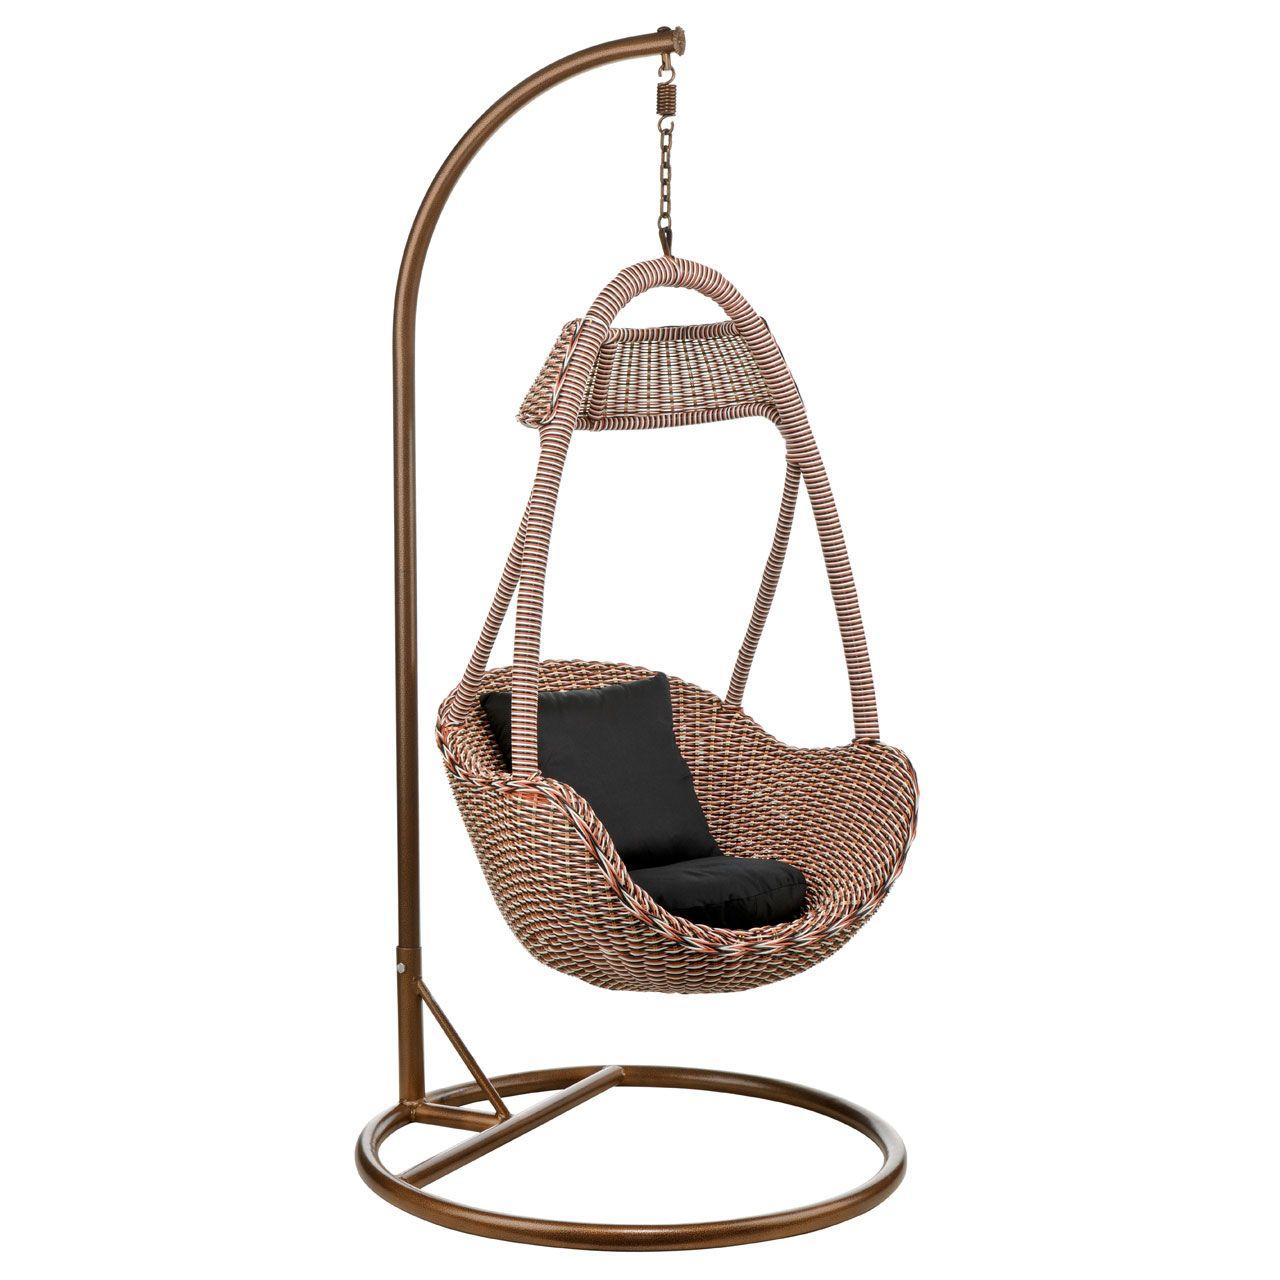 Rattan Hanging Chair U2013 2402690 U2013 A Stylish And Modern Take On A Classic 70s  Design